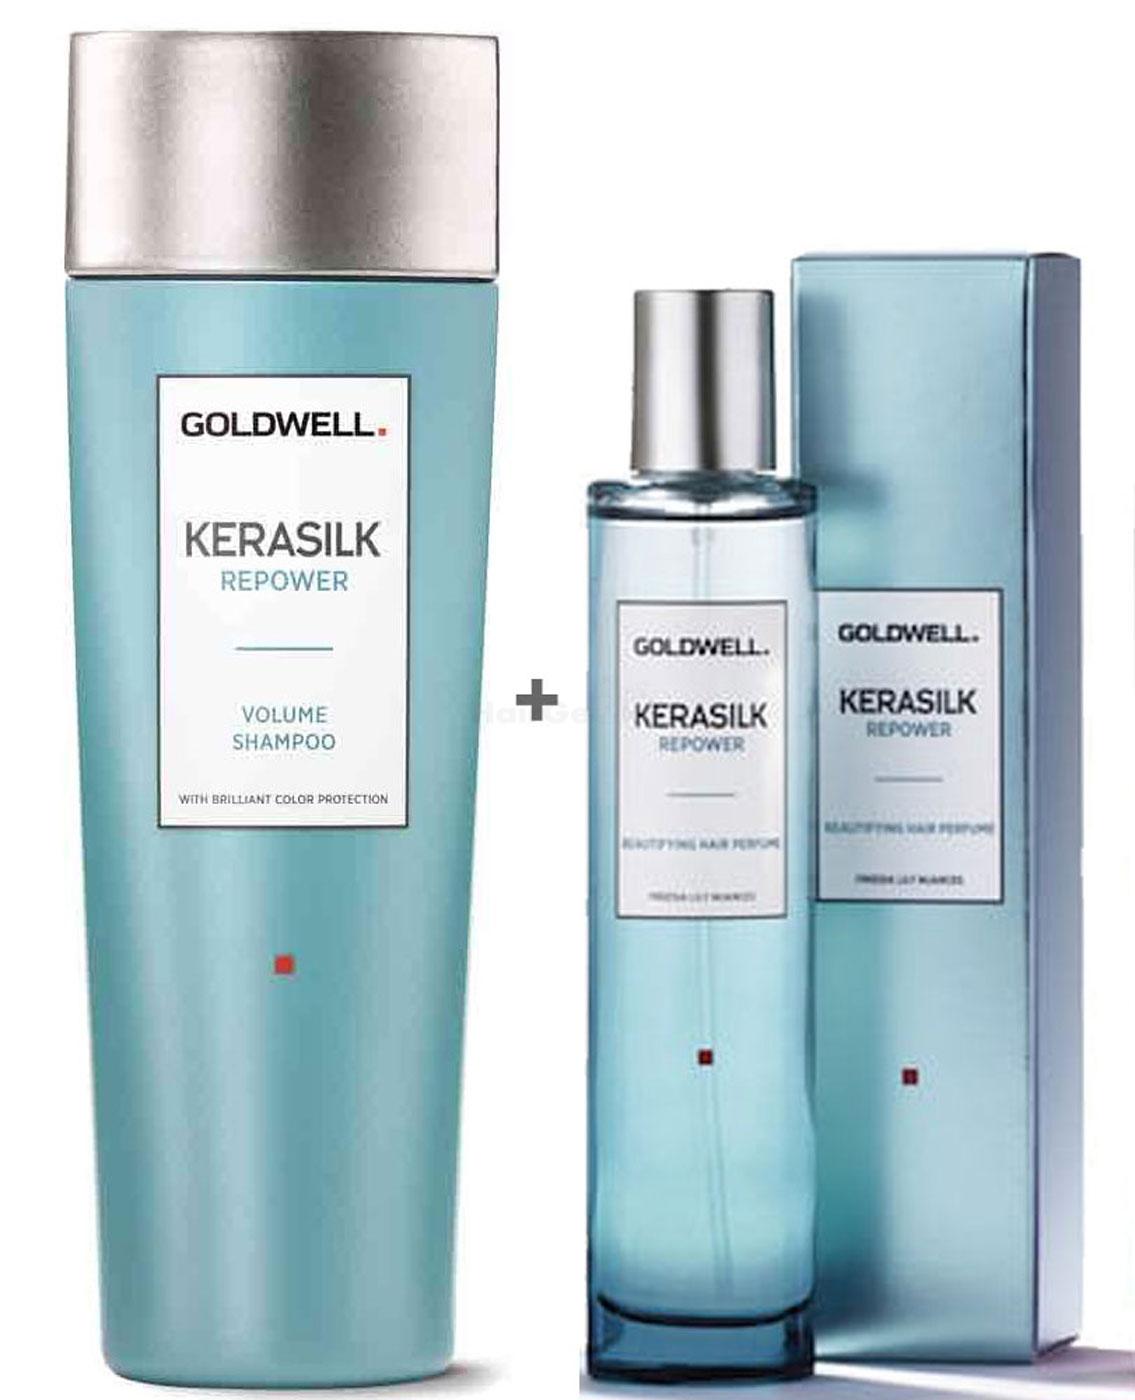 Goldwell Kerasilk Repower Set - Volume Shampoo 250ml + Haarparfum 50ml